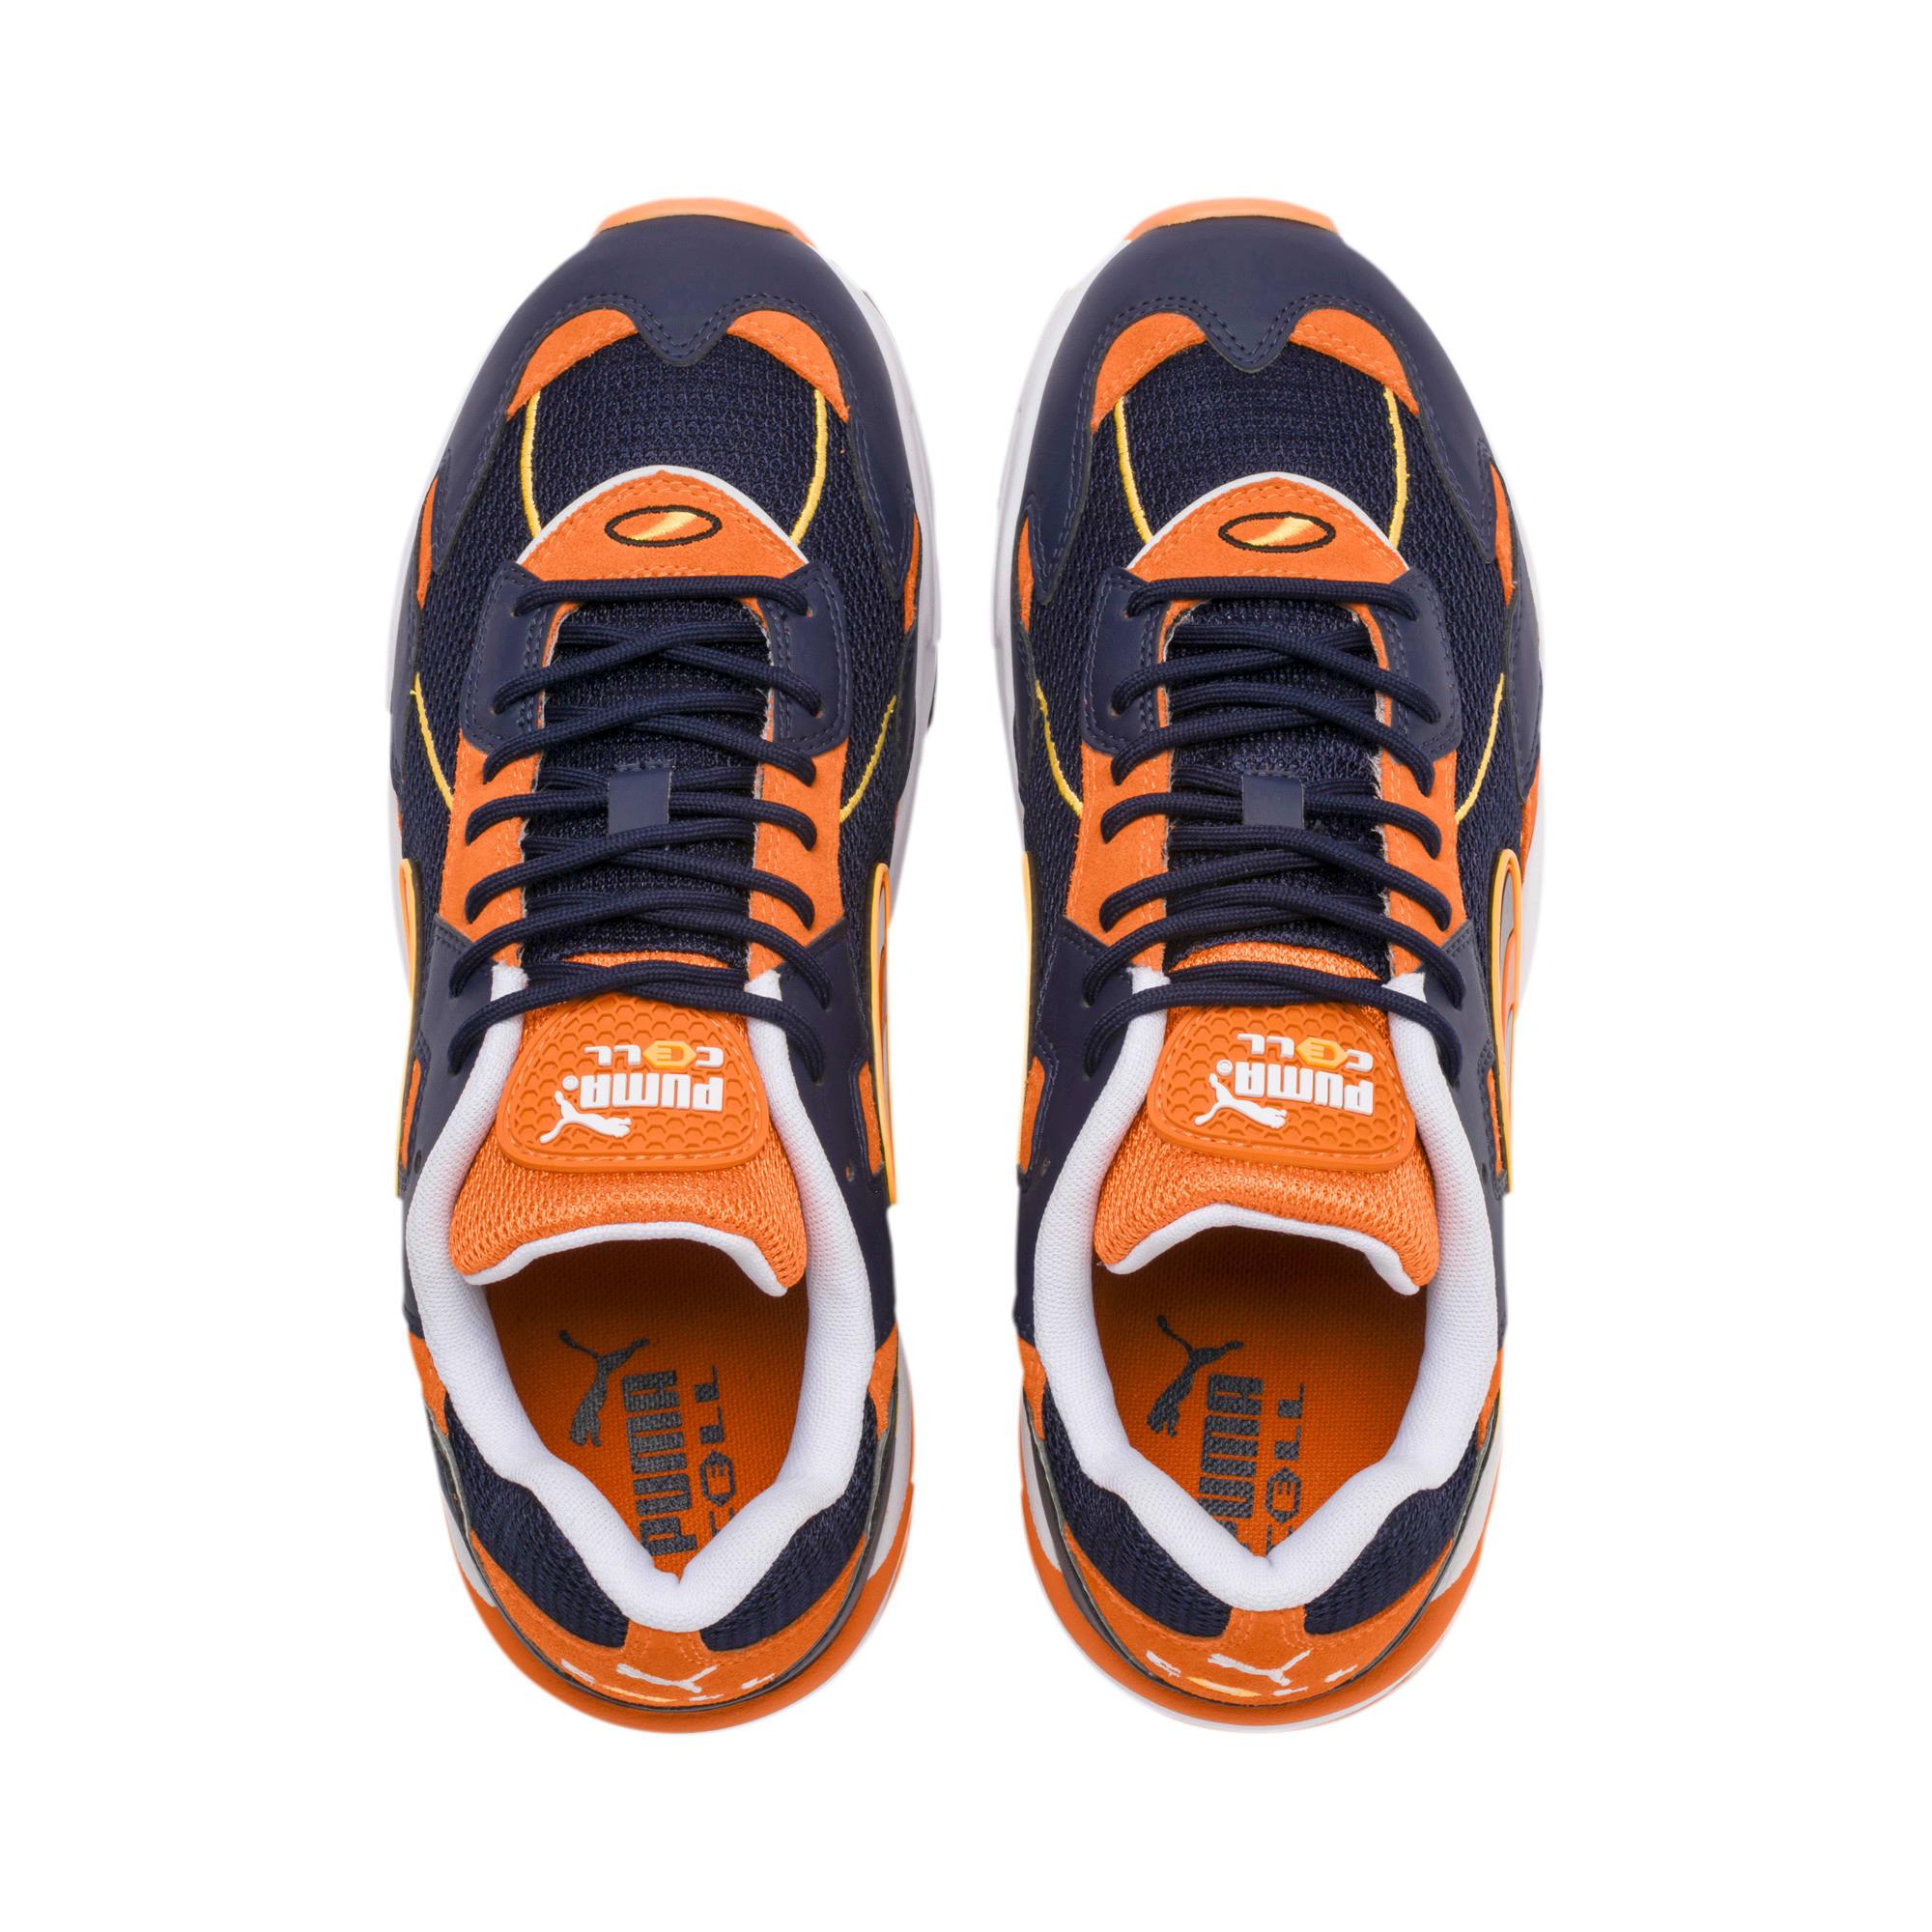 Thumbnail 7 of CELL Ultra OG Pack Sneakers, Peacoat-Jaffa Orange, medium